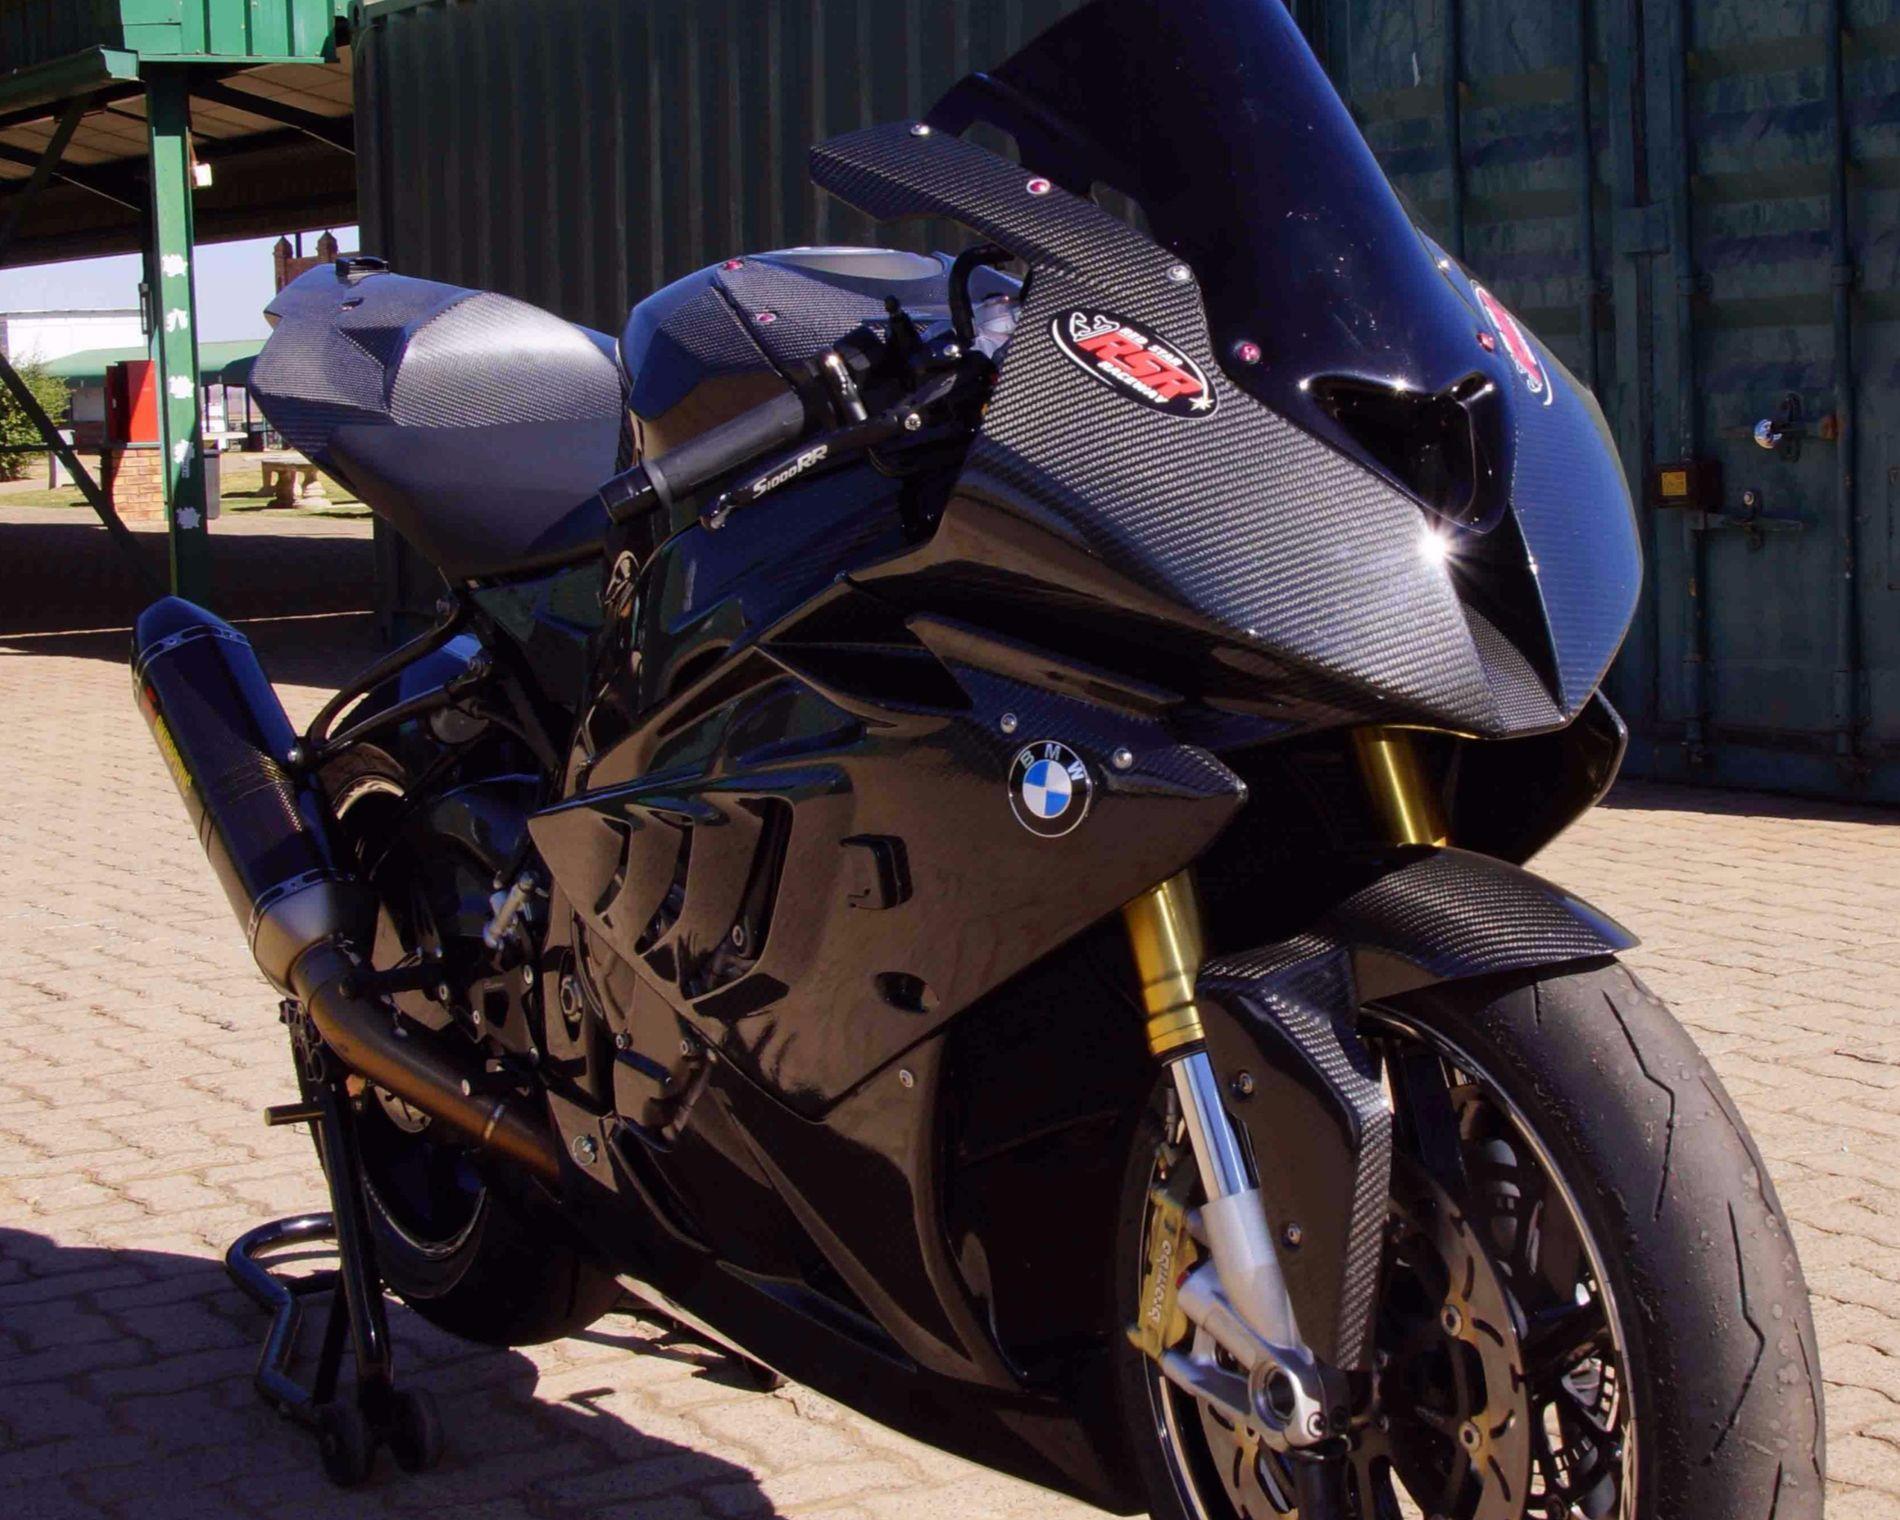 bmw s1000rr special carbon racing edition track bike. Black Bedroom Furniture Sets. Home Design Ideas